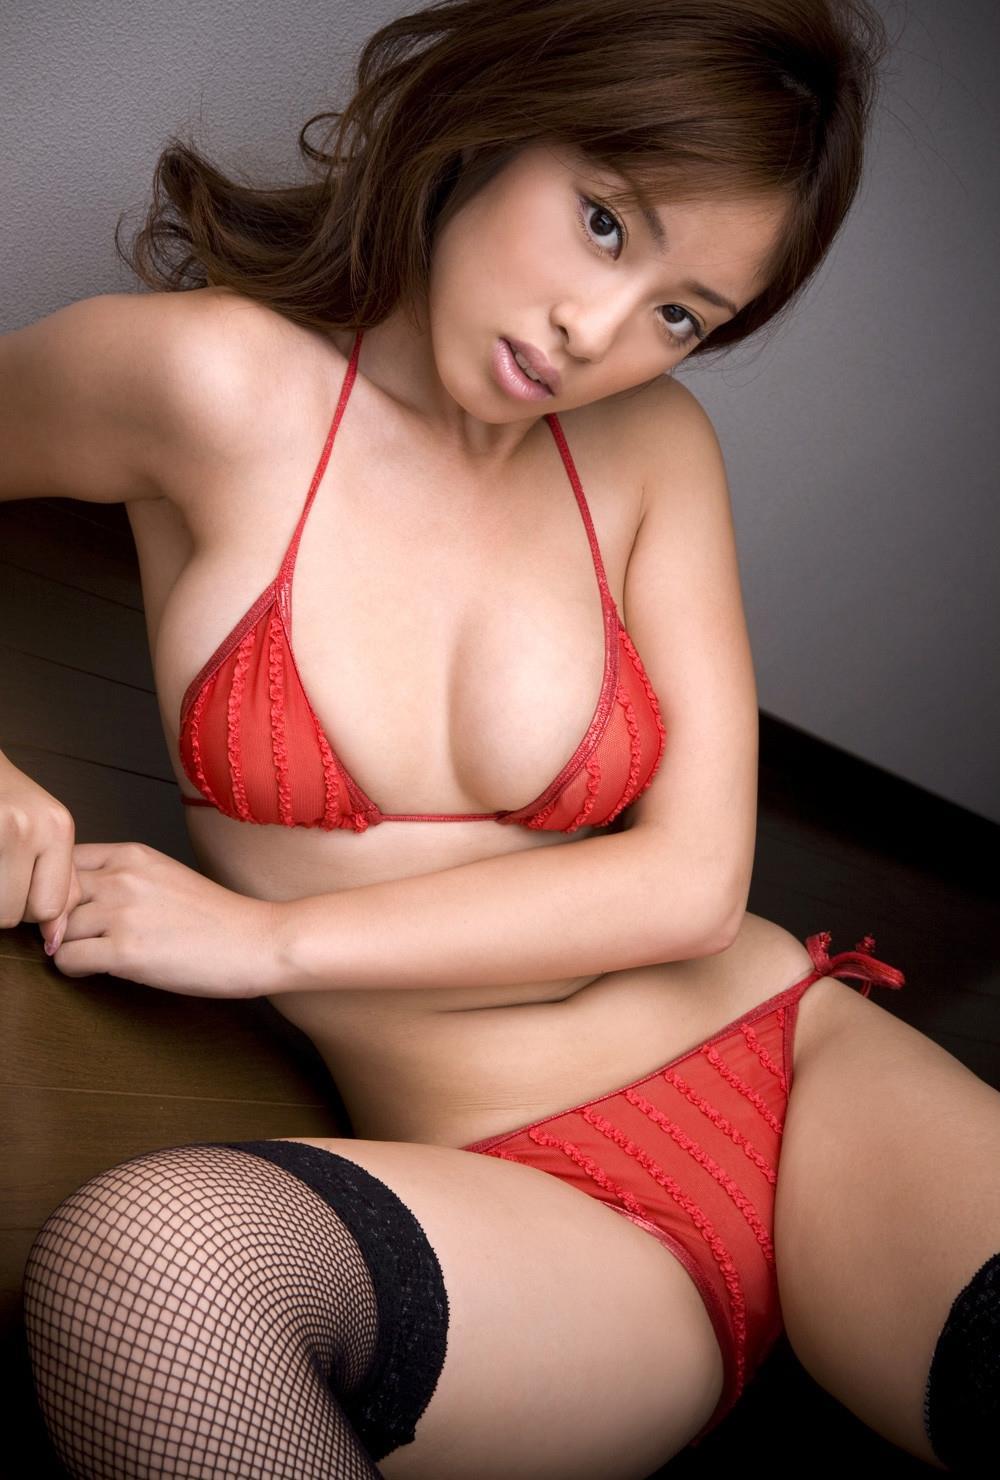 野田彩加 エロ画像 56